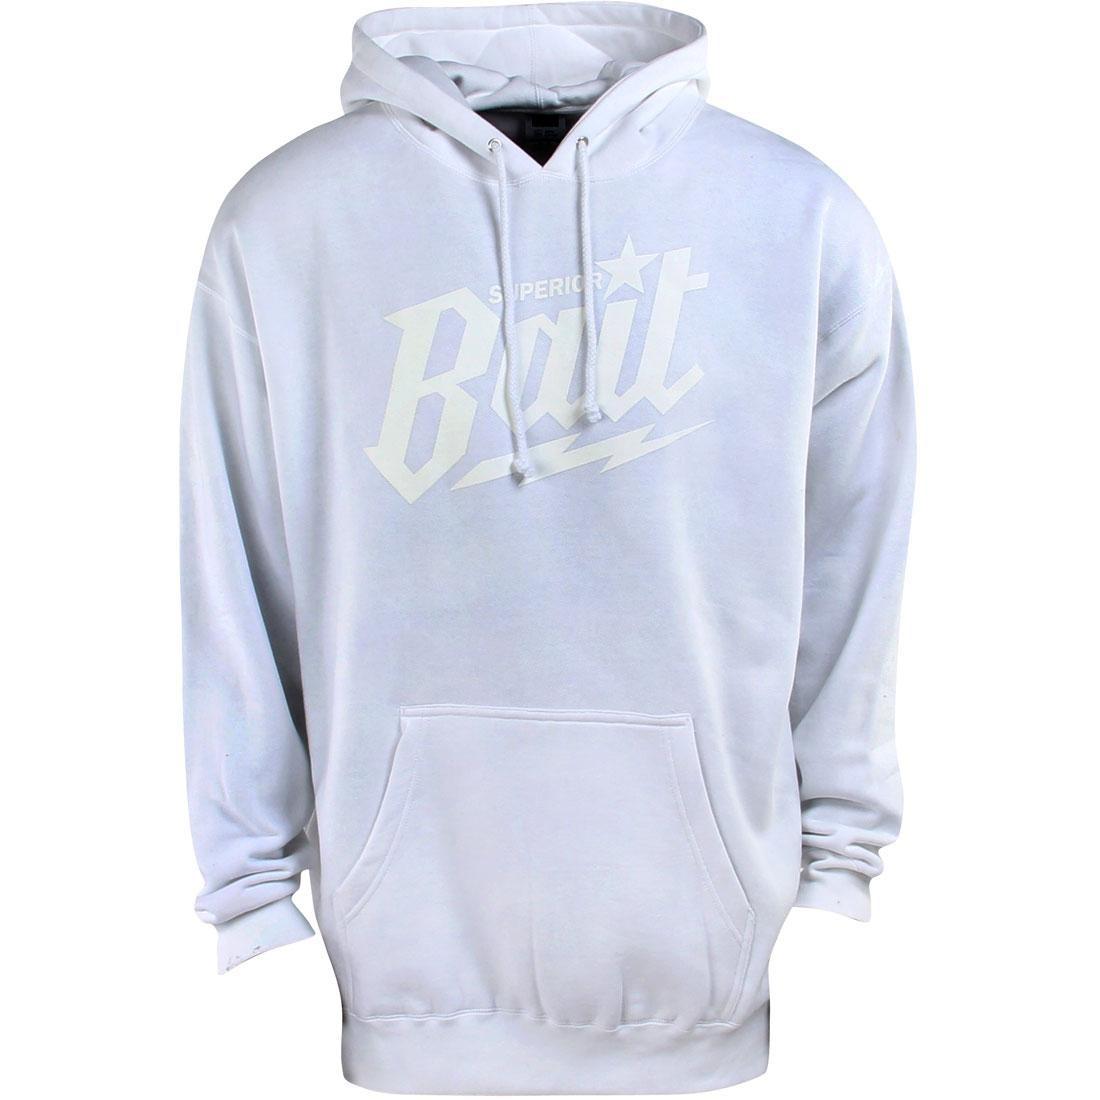 BAIT Superior BAIT Hoody (white / white)